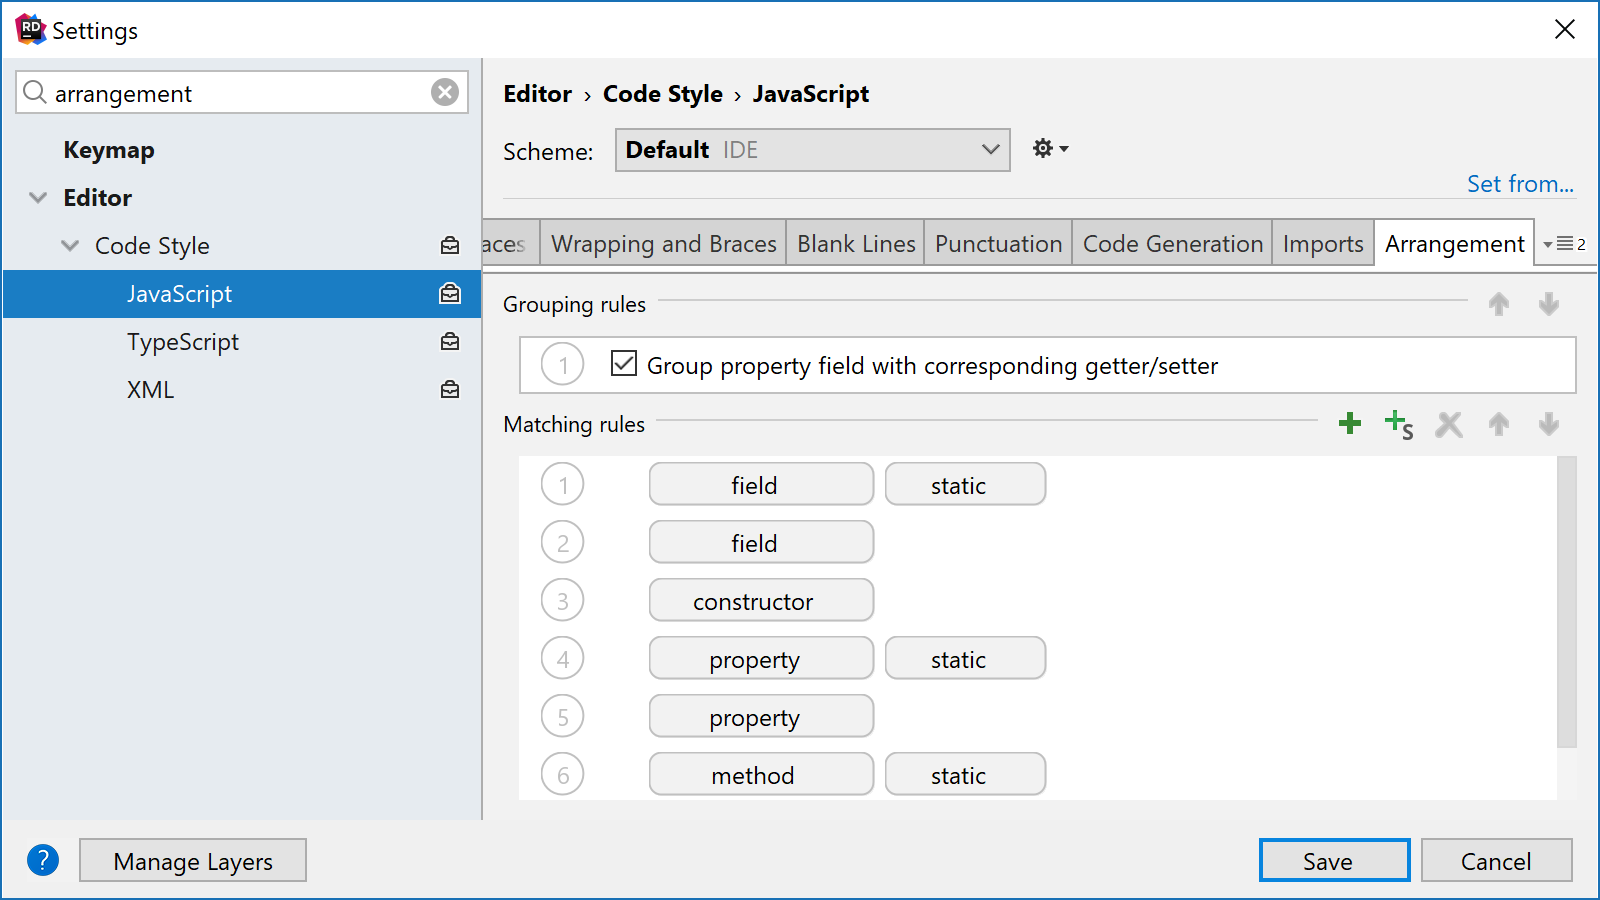 JavaScript and TypeScript class members arrangement